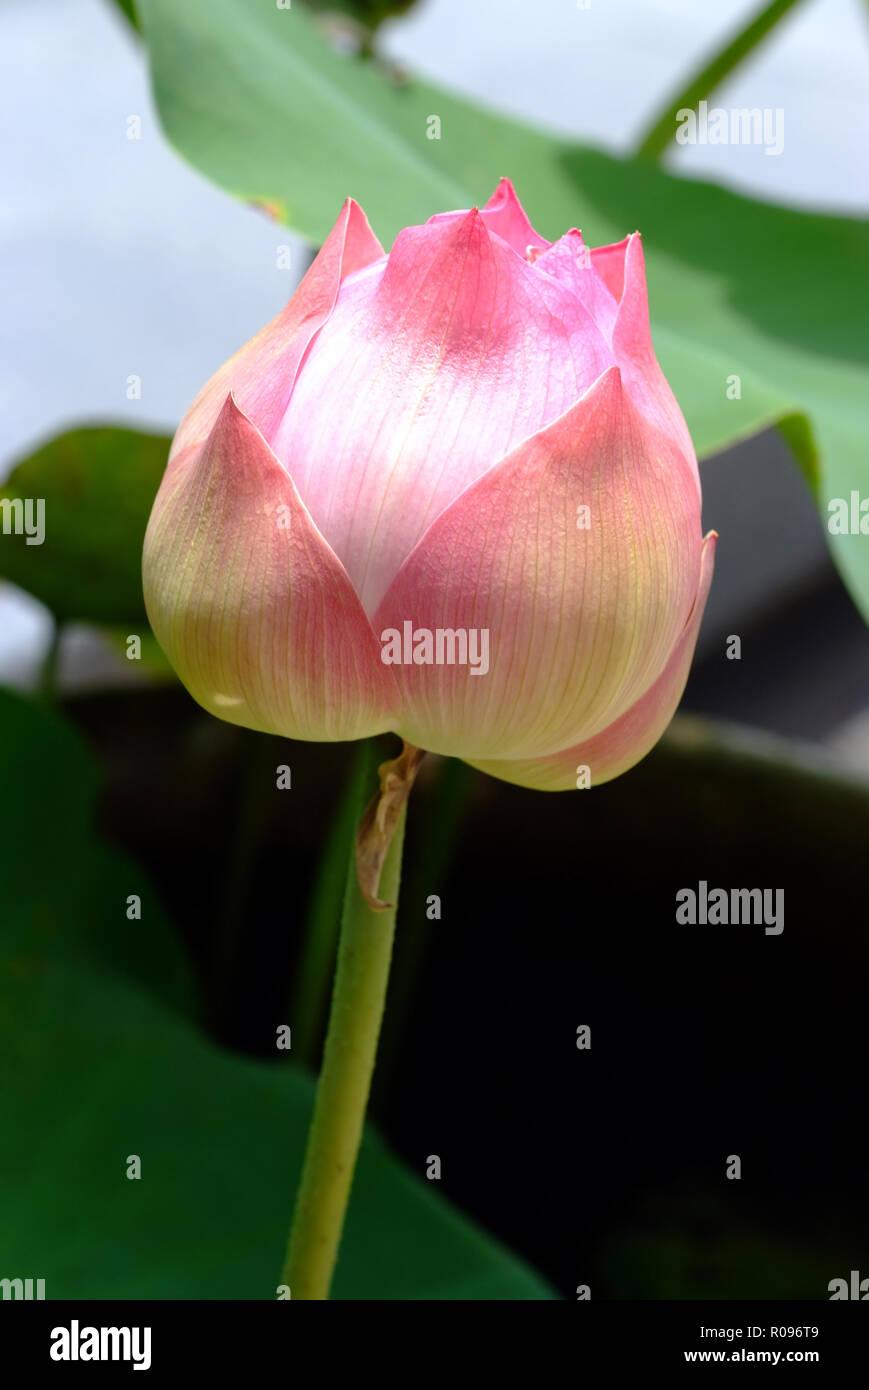 Lotus Flower Rare Flower Ancient Flower Symbol Of Purity Symbol